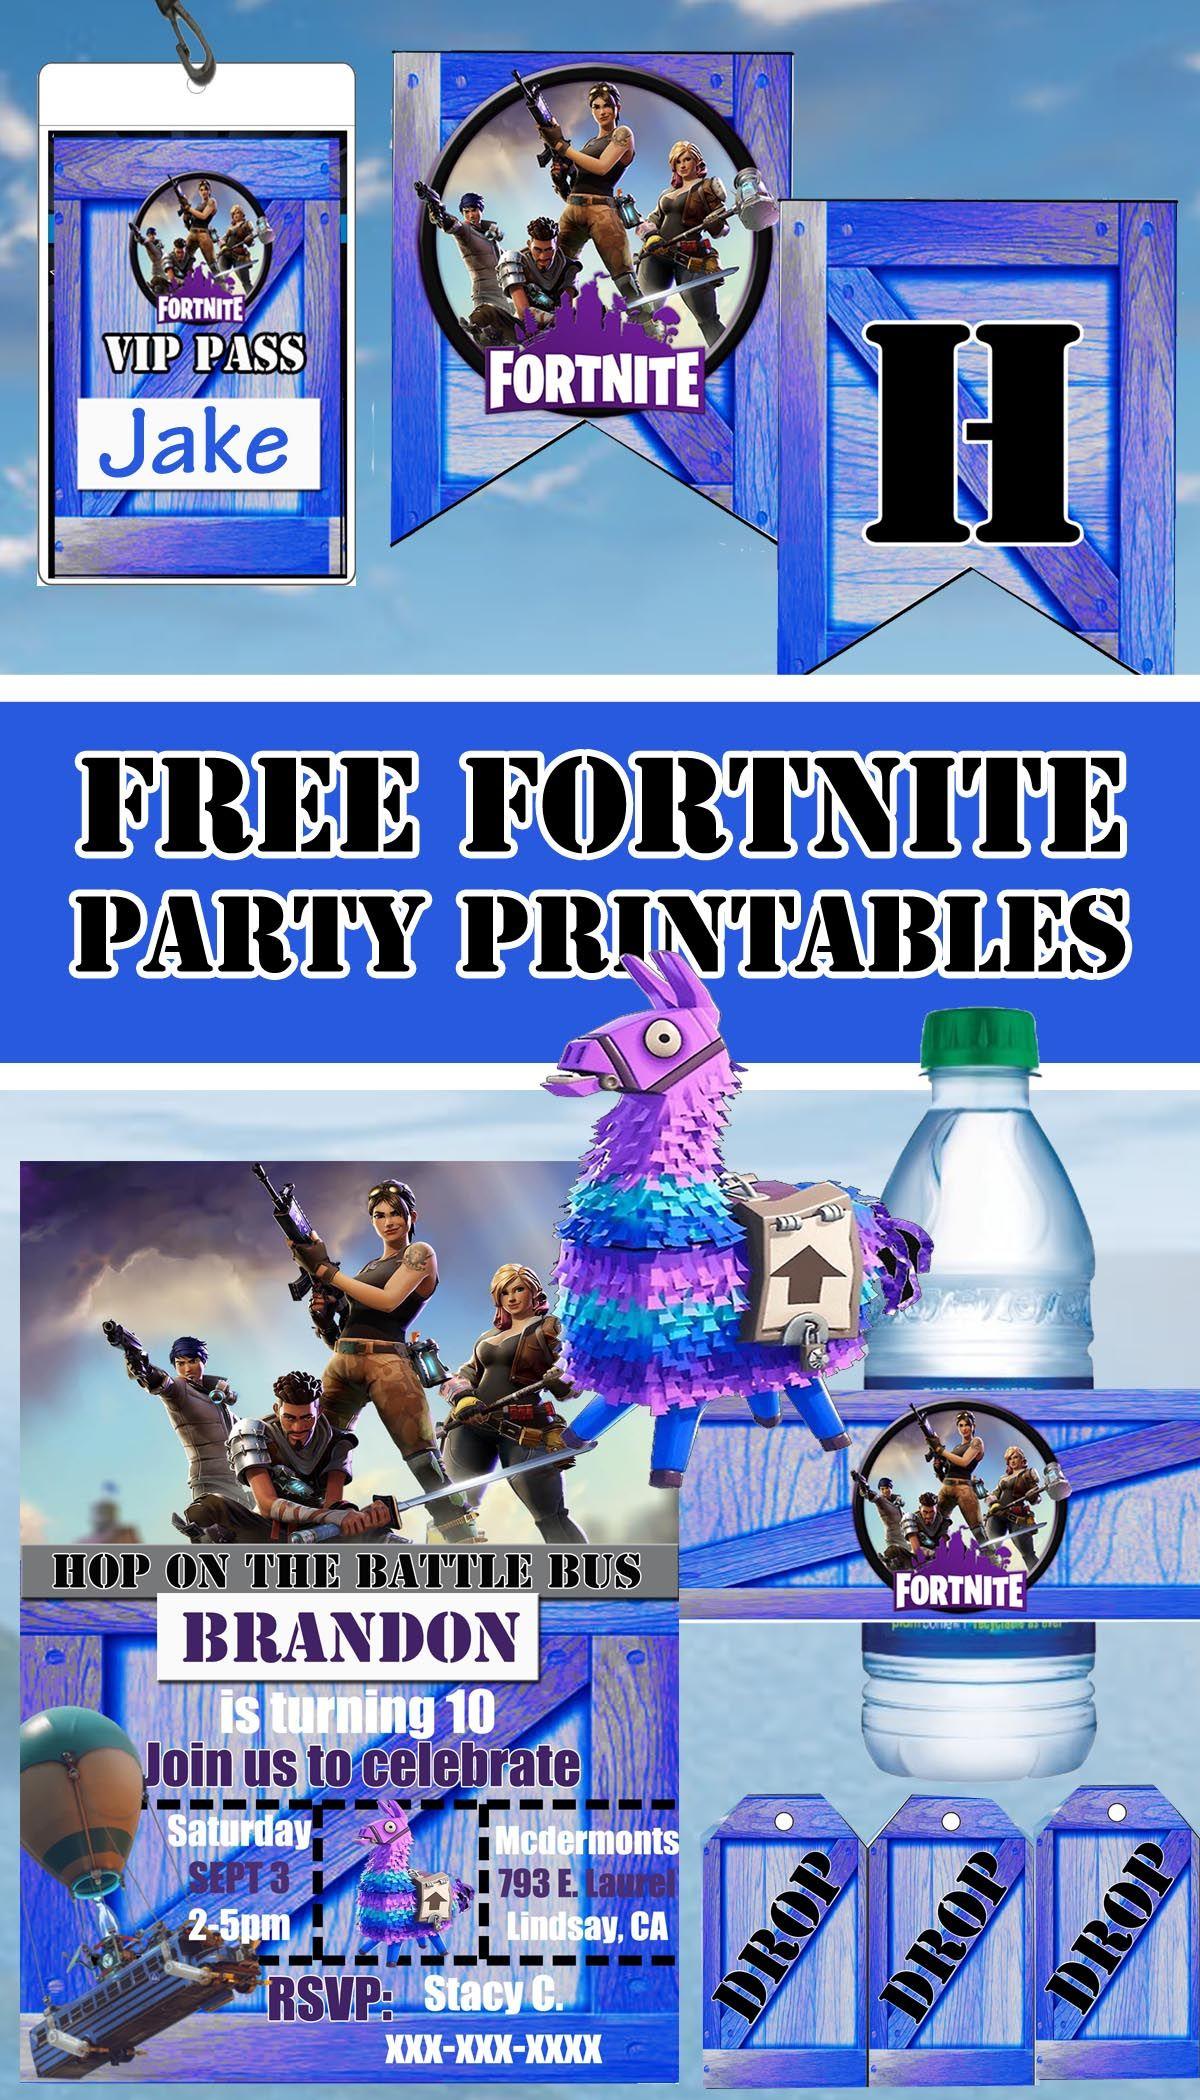 Printable Fortnite Images